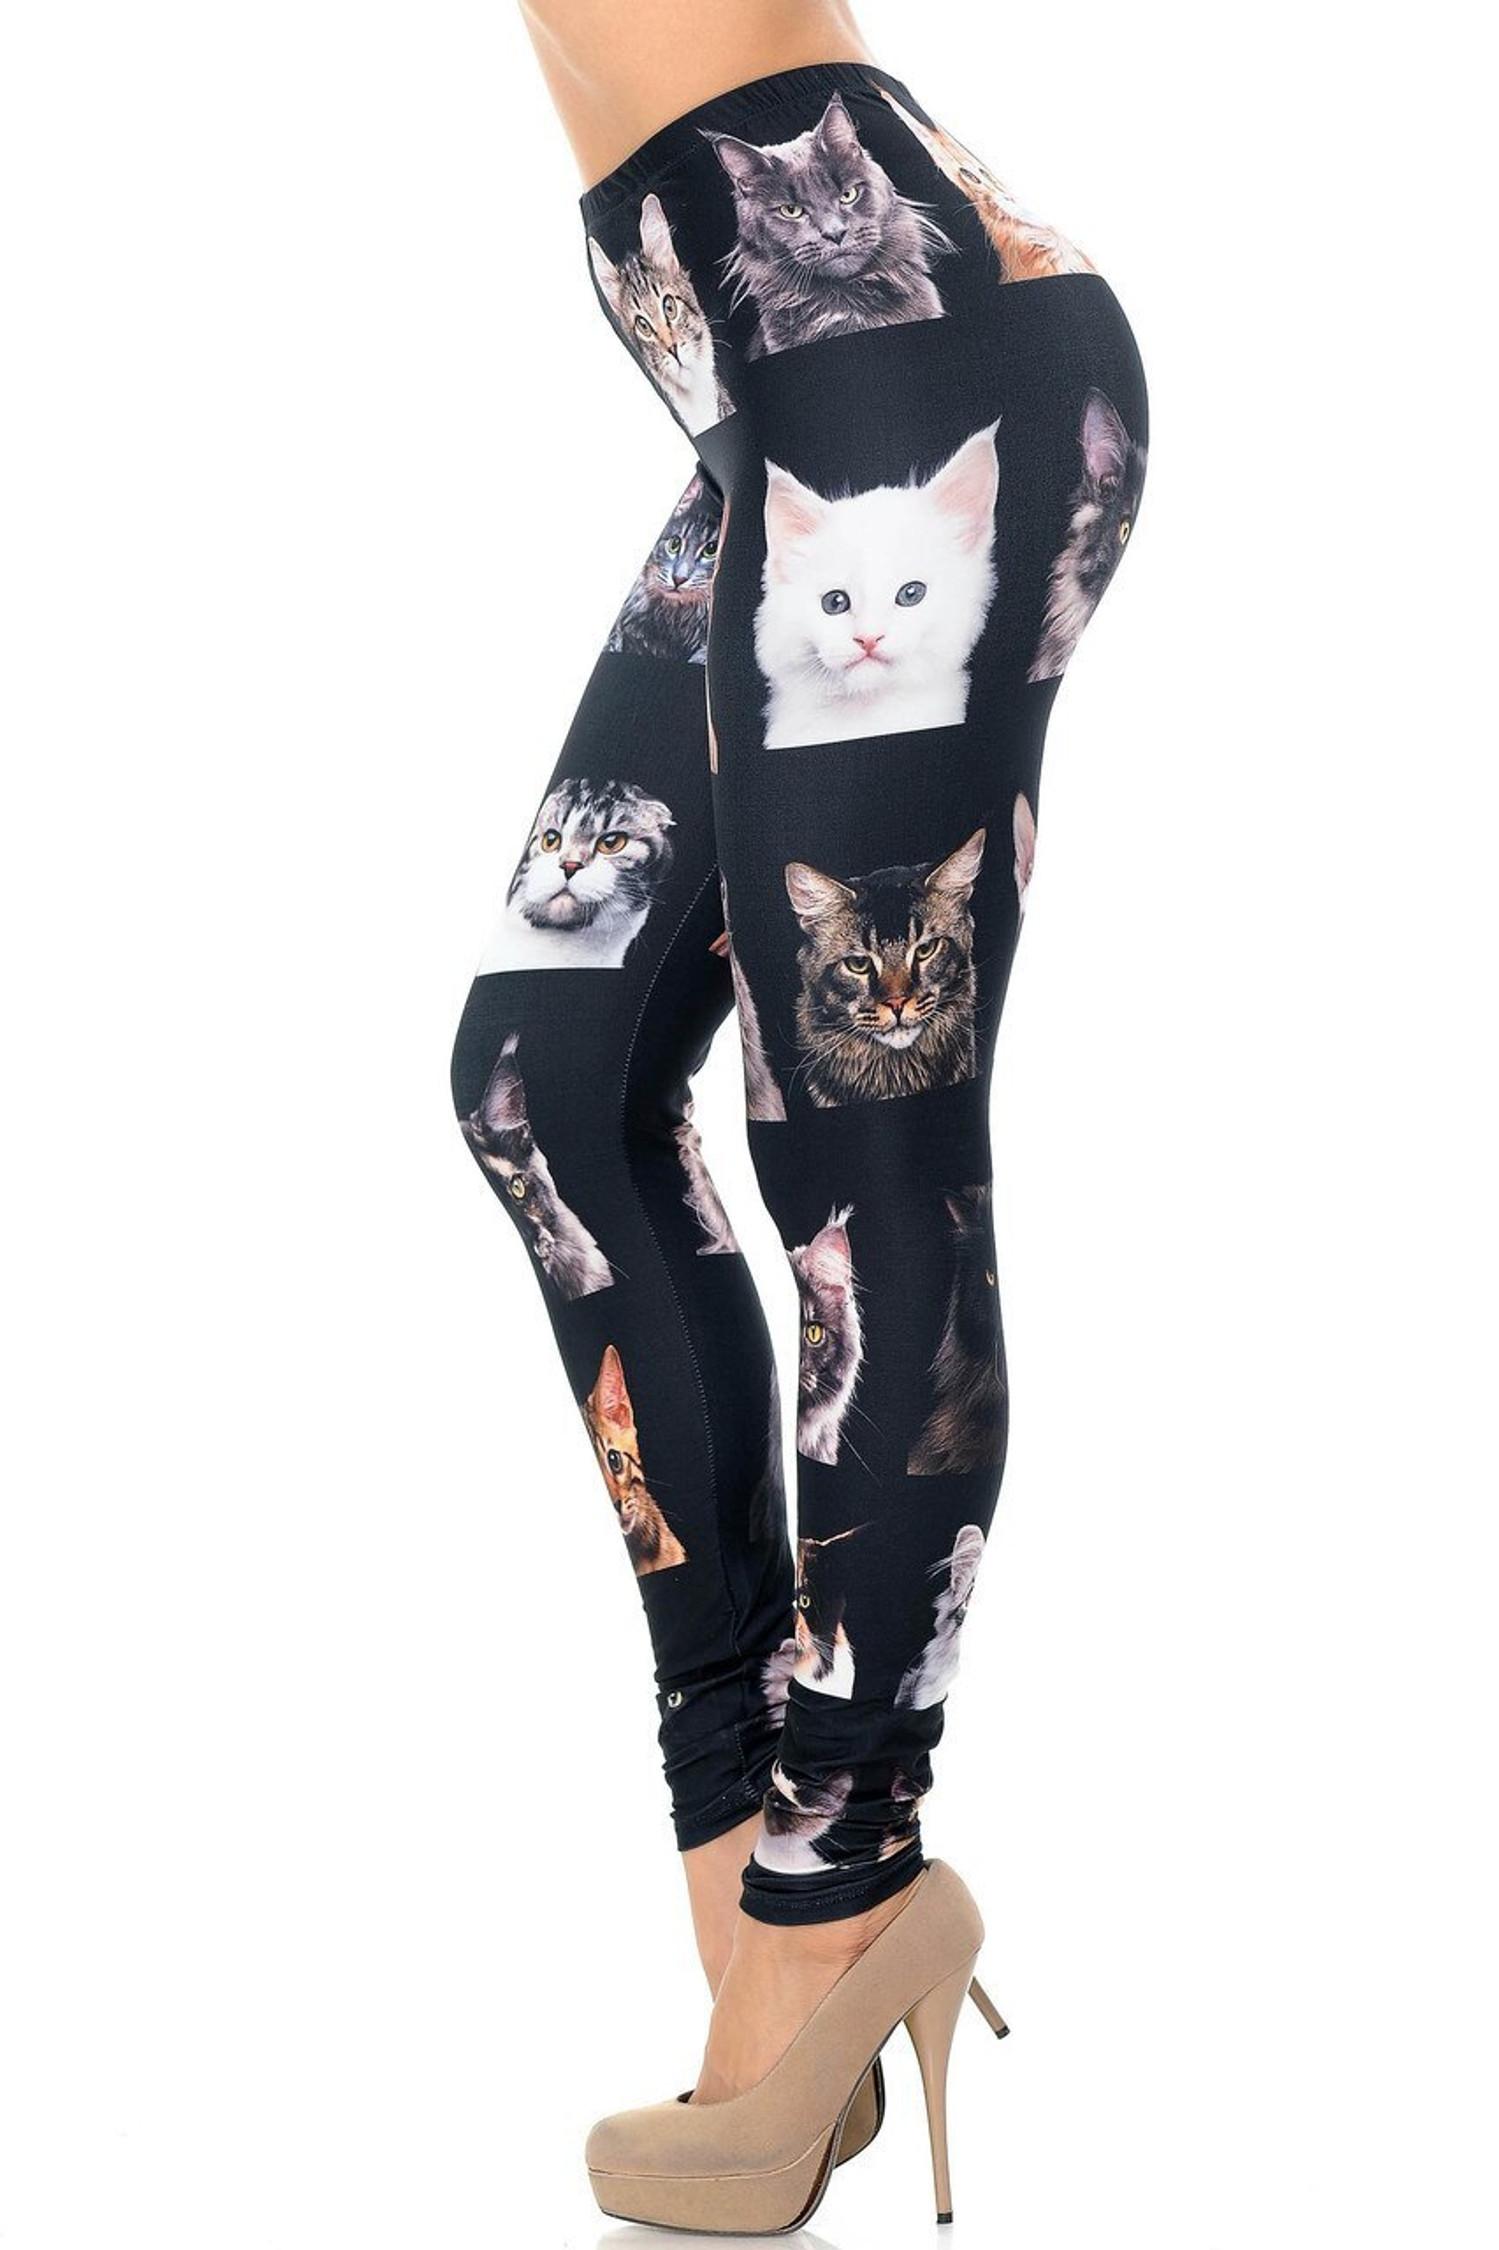 Creamy Soft Cute Cat Faces Plus Size Leggings - Version 2 - USA Fashion™